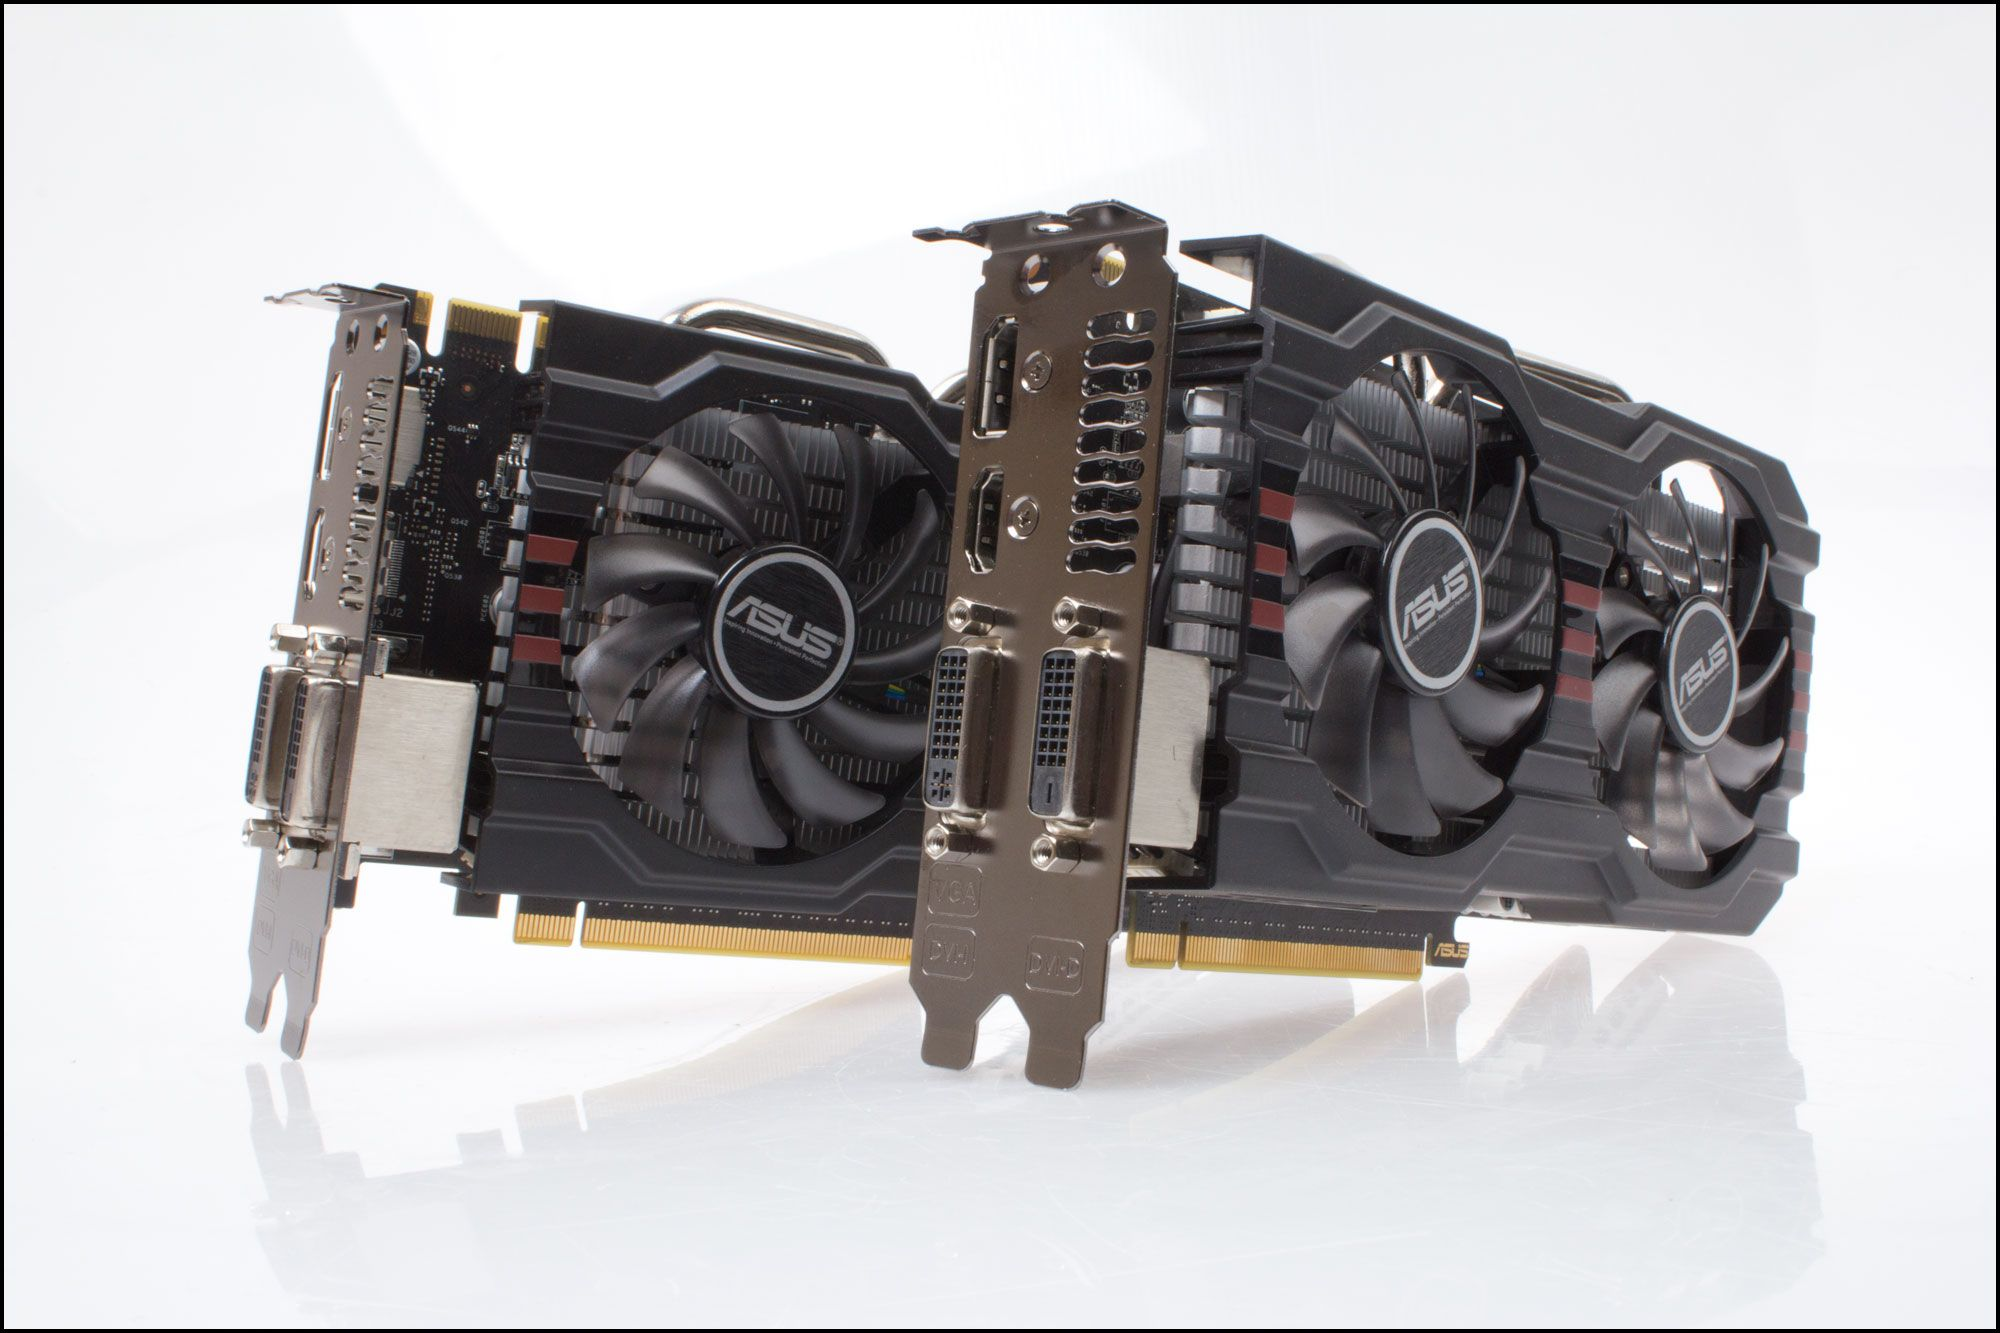 Asus GeForce GTX 650Ti BOOST DirectCU II OC.Foto: Varg Aamo, Hardware.no